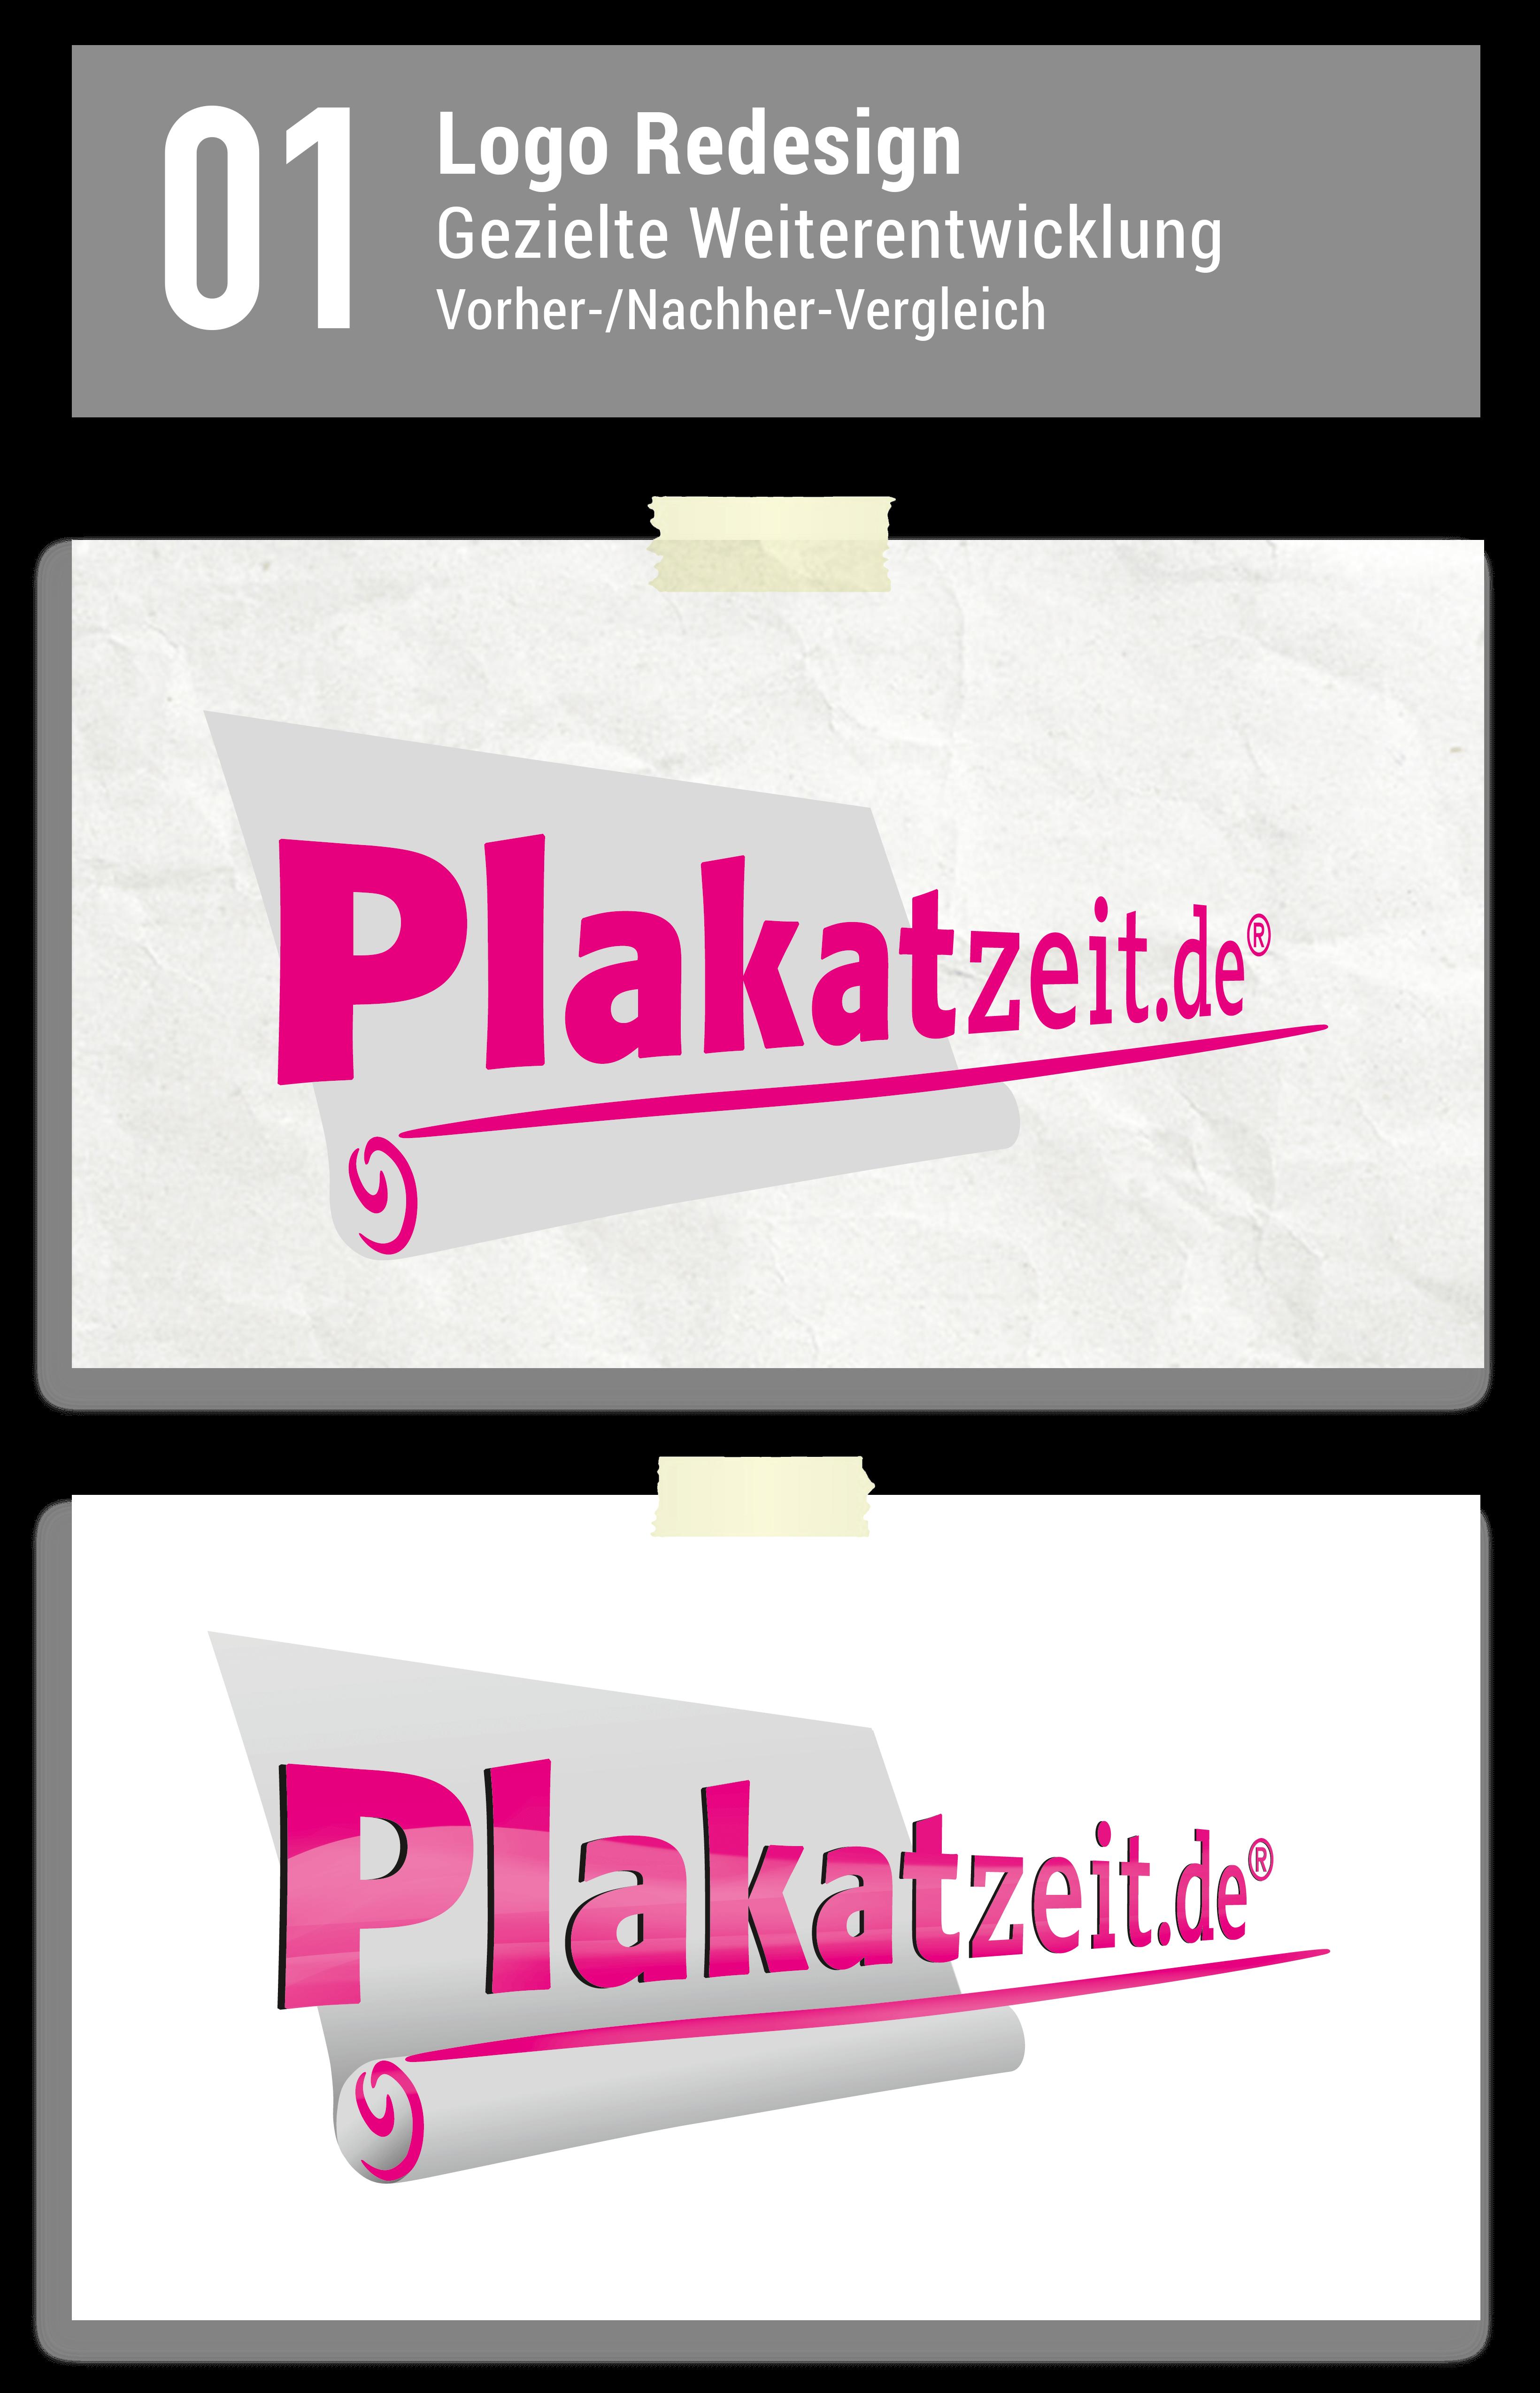 Redesign_Plakatz_RZ